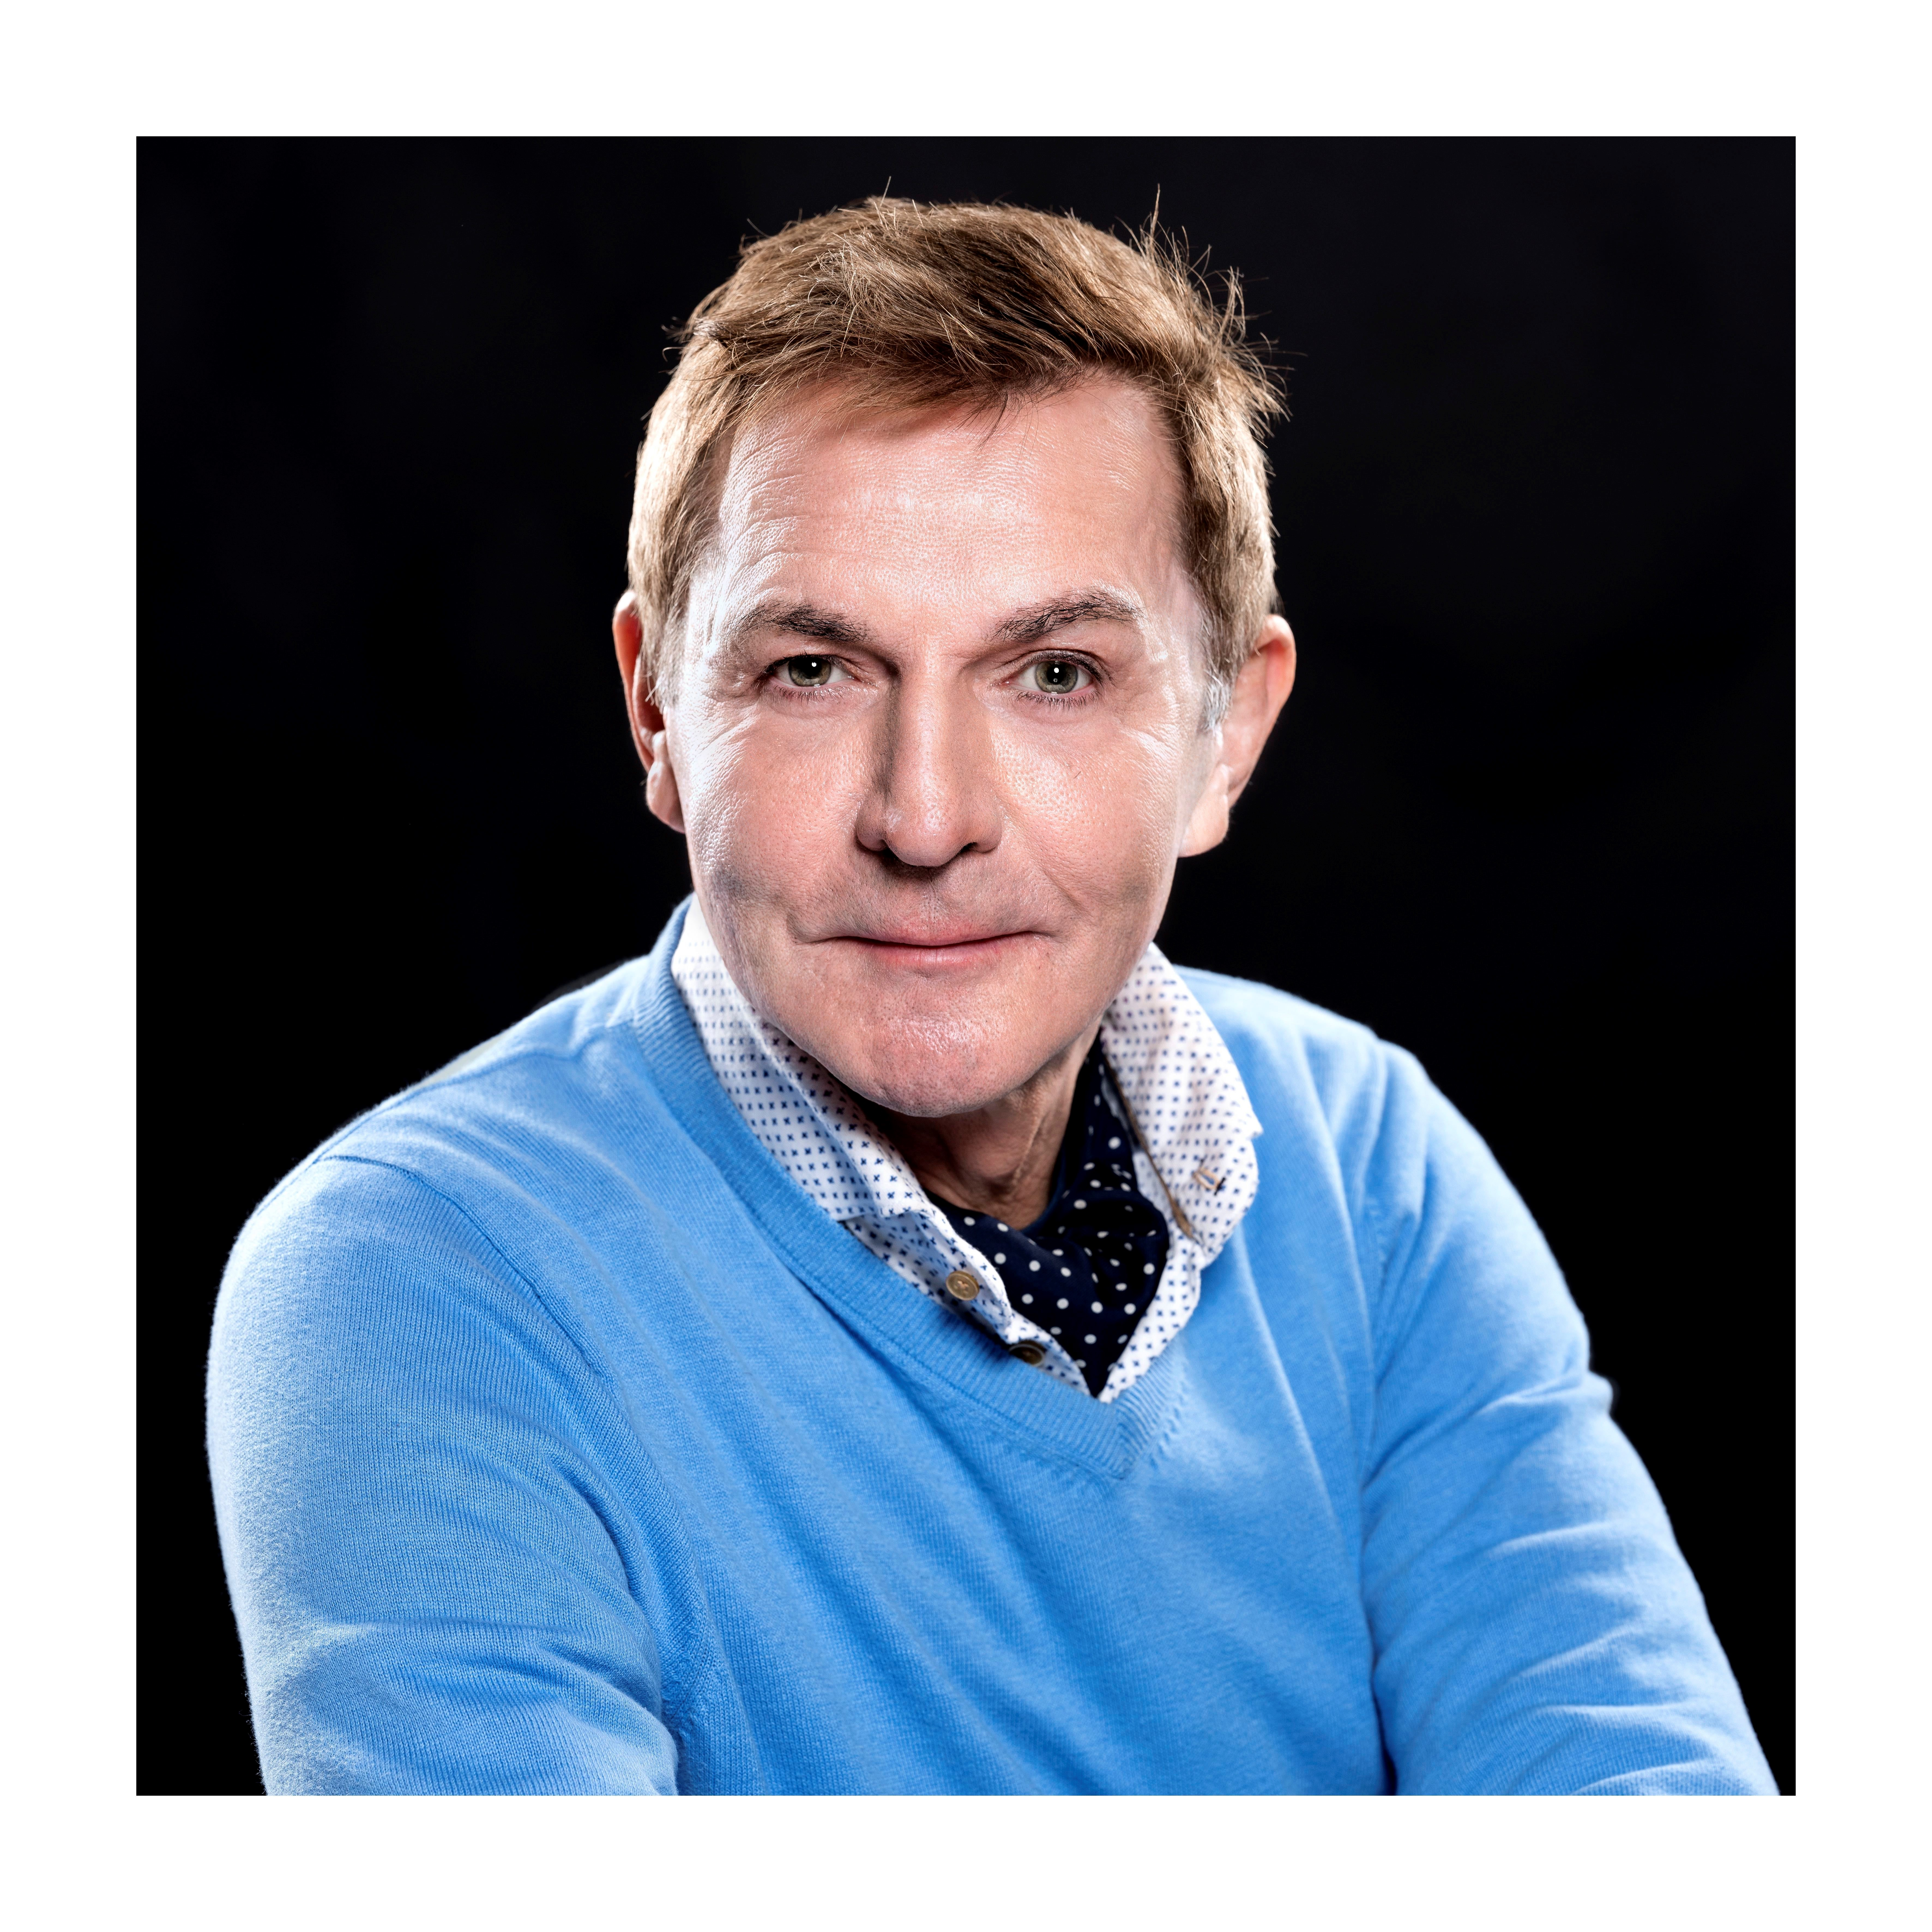 Luc Appermont nieuwe presentator Het Schlagerfestival in 2020! - LucAppermont 1